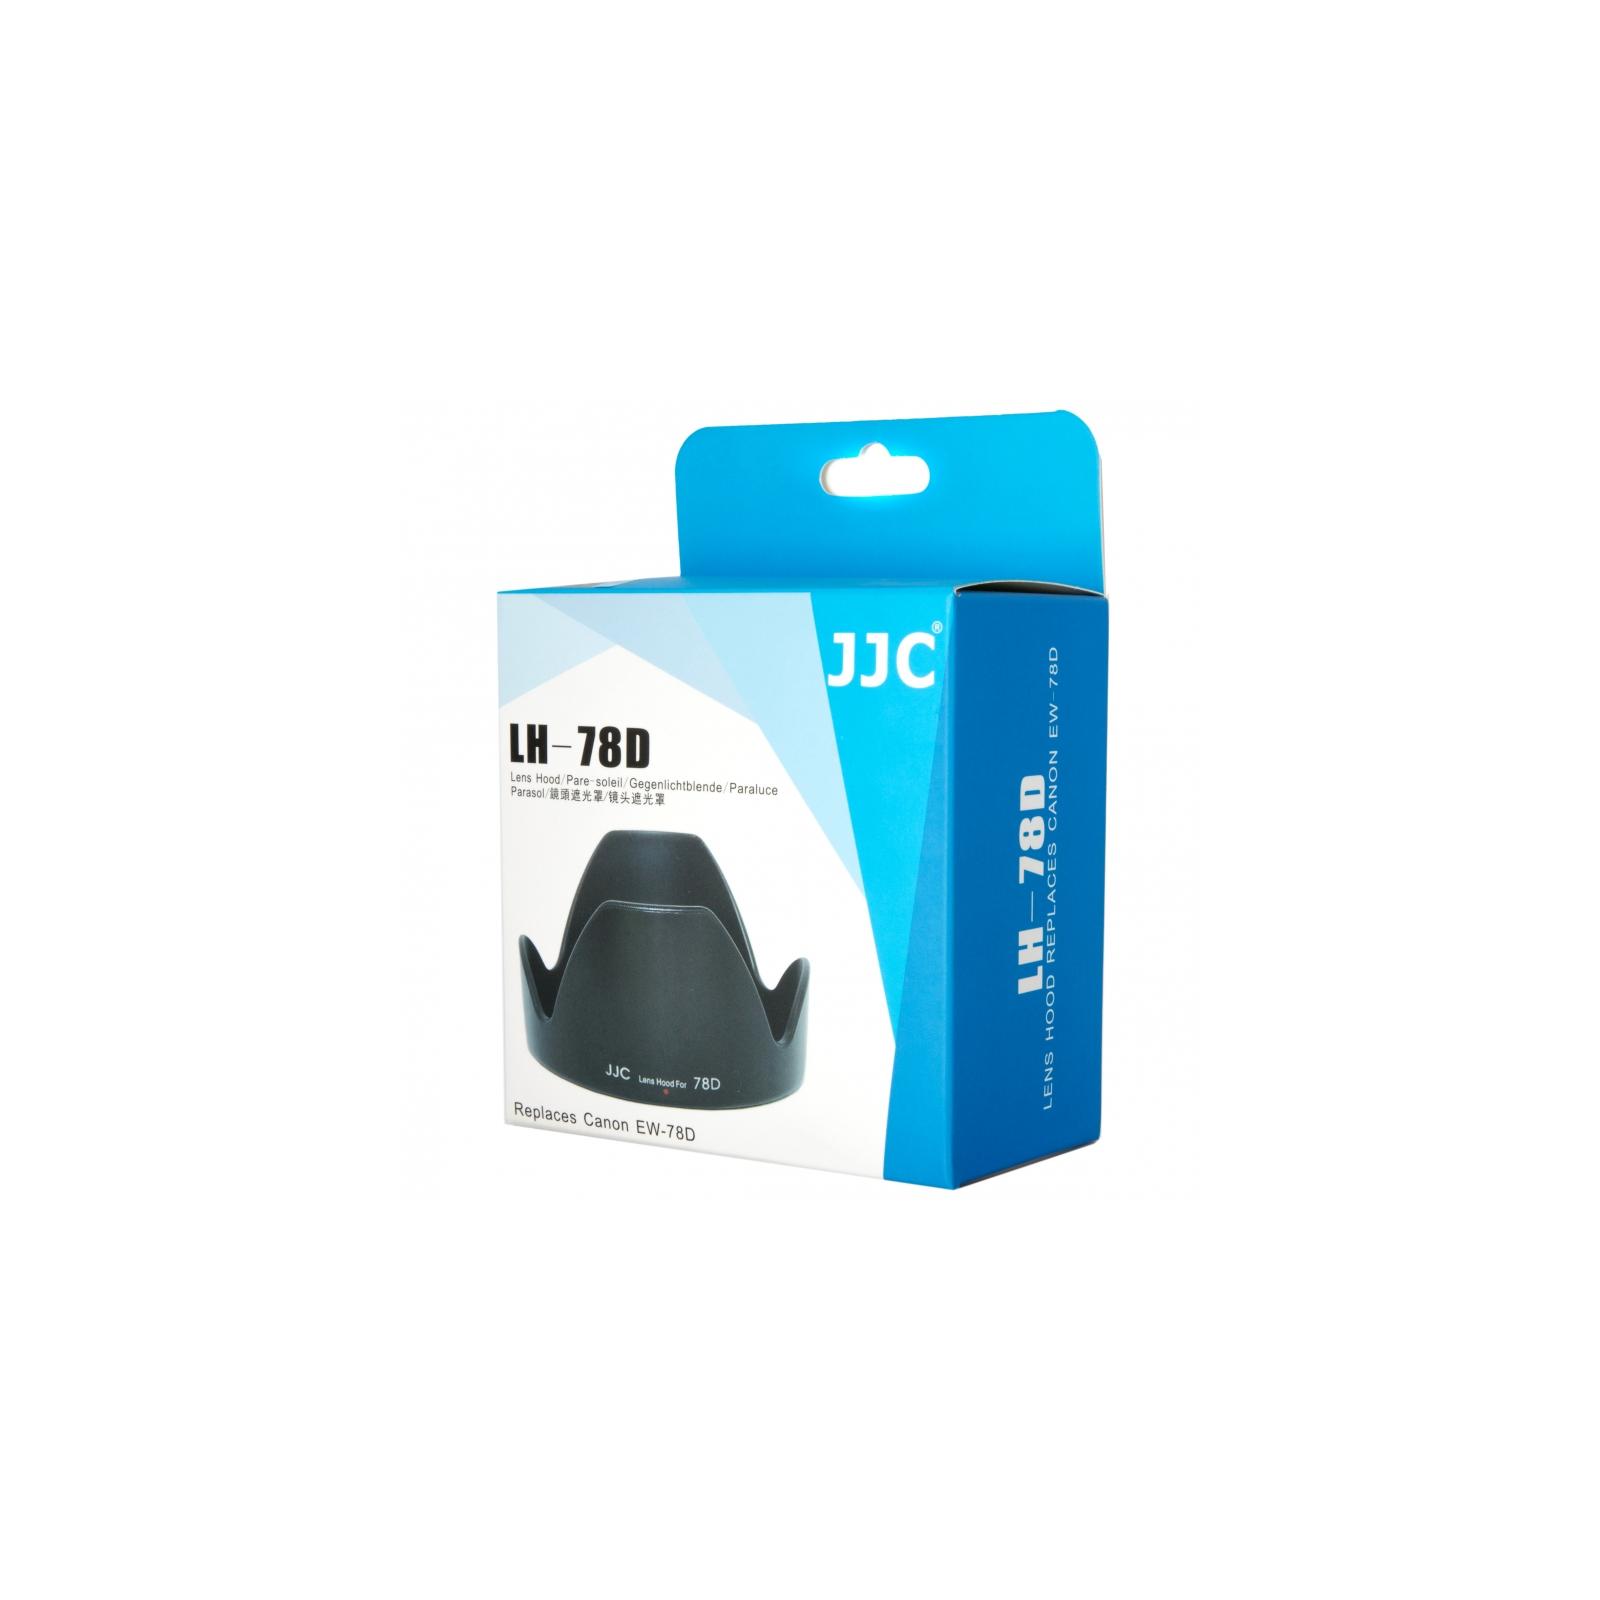 Бленда к объективу JJC LH-78D (Canon 18-200mm, 28-200mm) (J-LH-78D) изображение 4